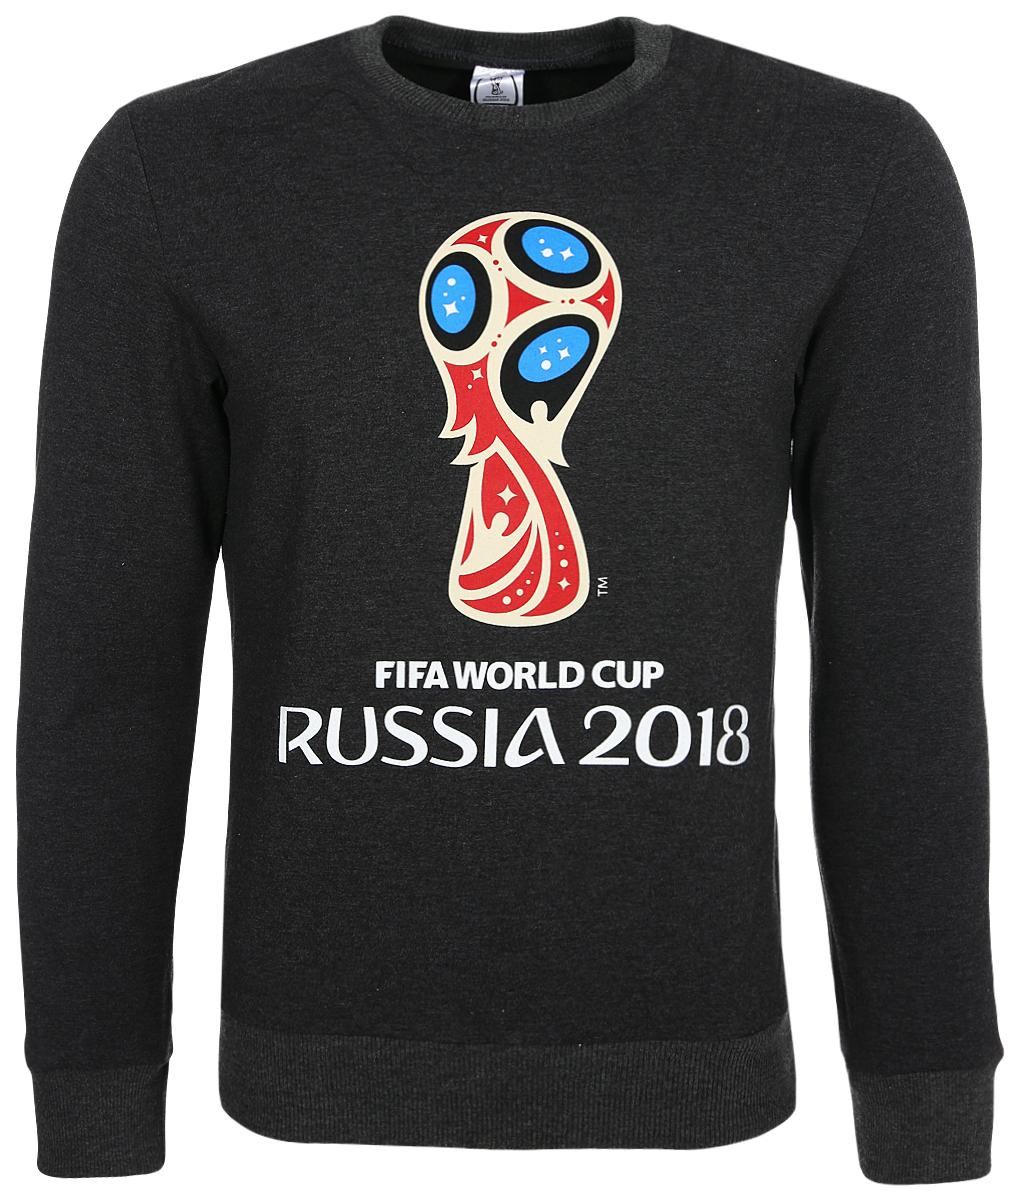 Свитшот FIFA World Cup Russia пижама детская fifa world cup russia цвет красный f1 14 размер 68 74